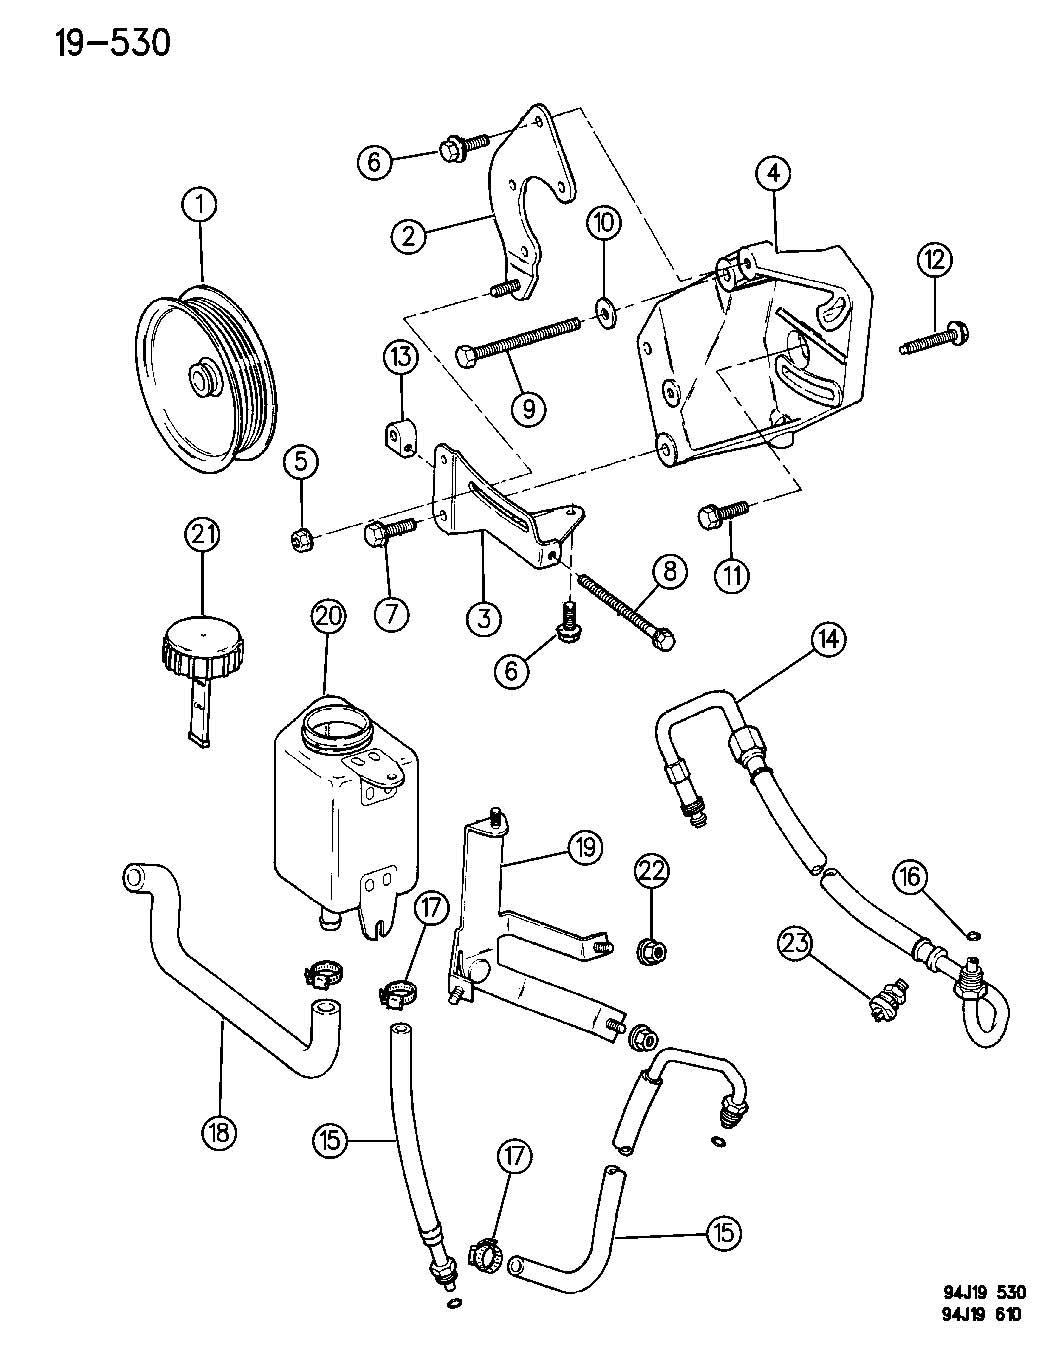 jeep grand cherokee power steering engine diagram  jeep